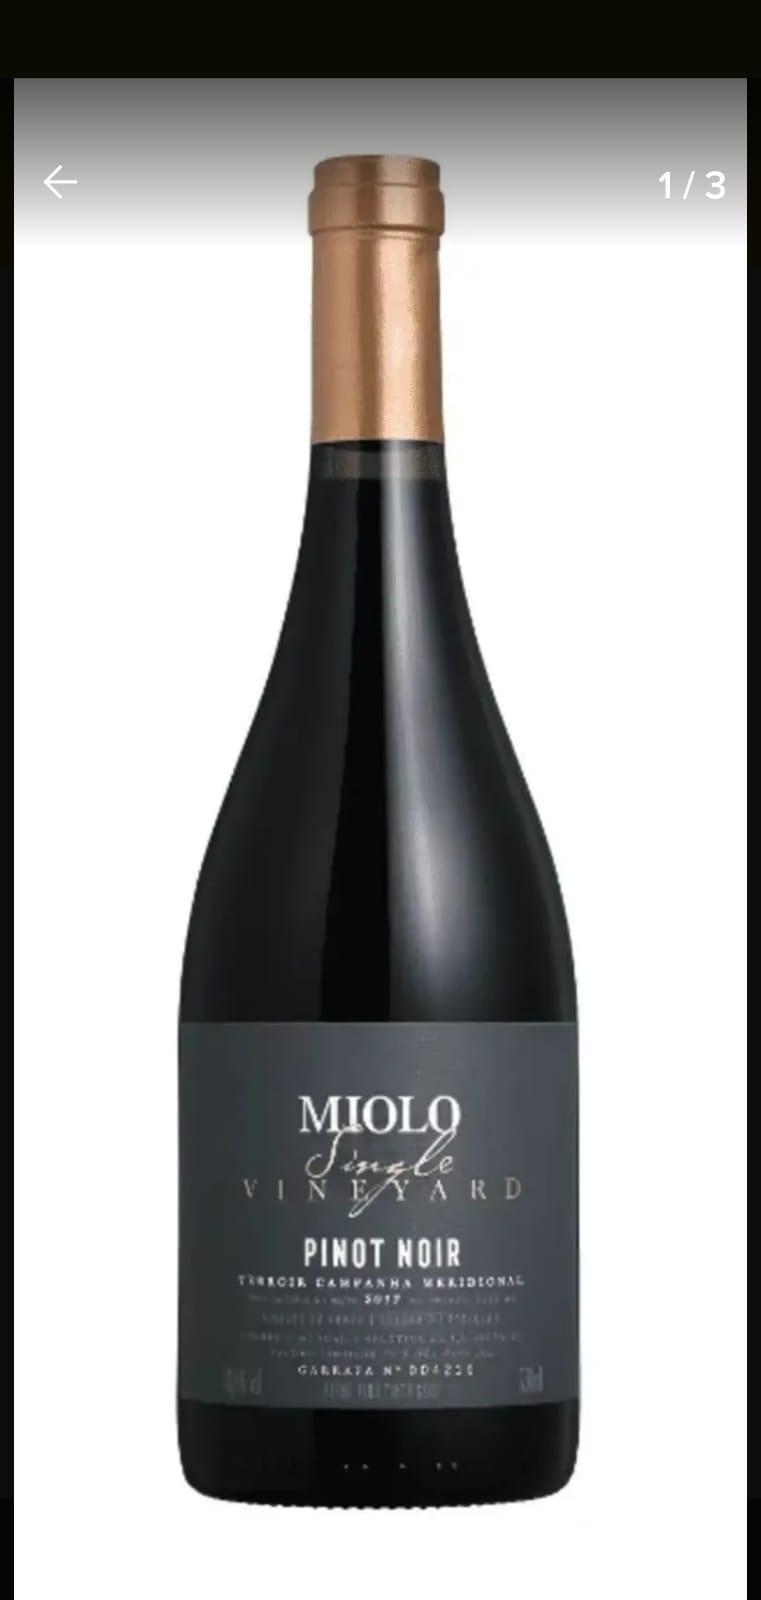 Vinho Miolo Single pinot noir 750ml